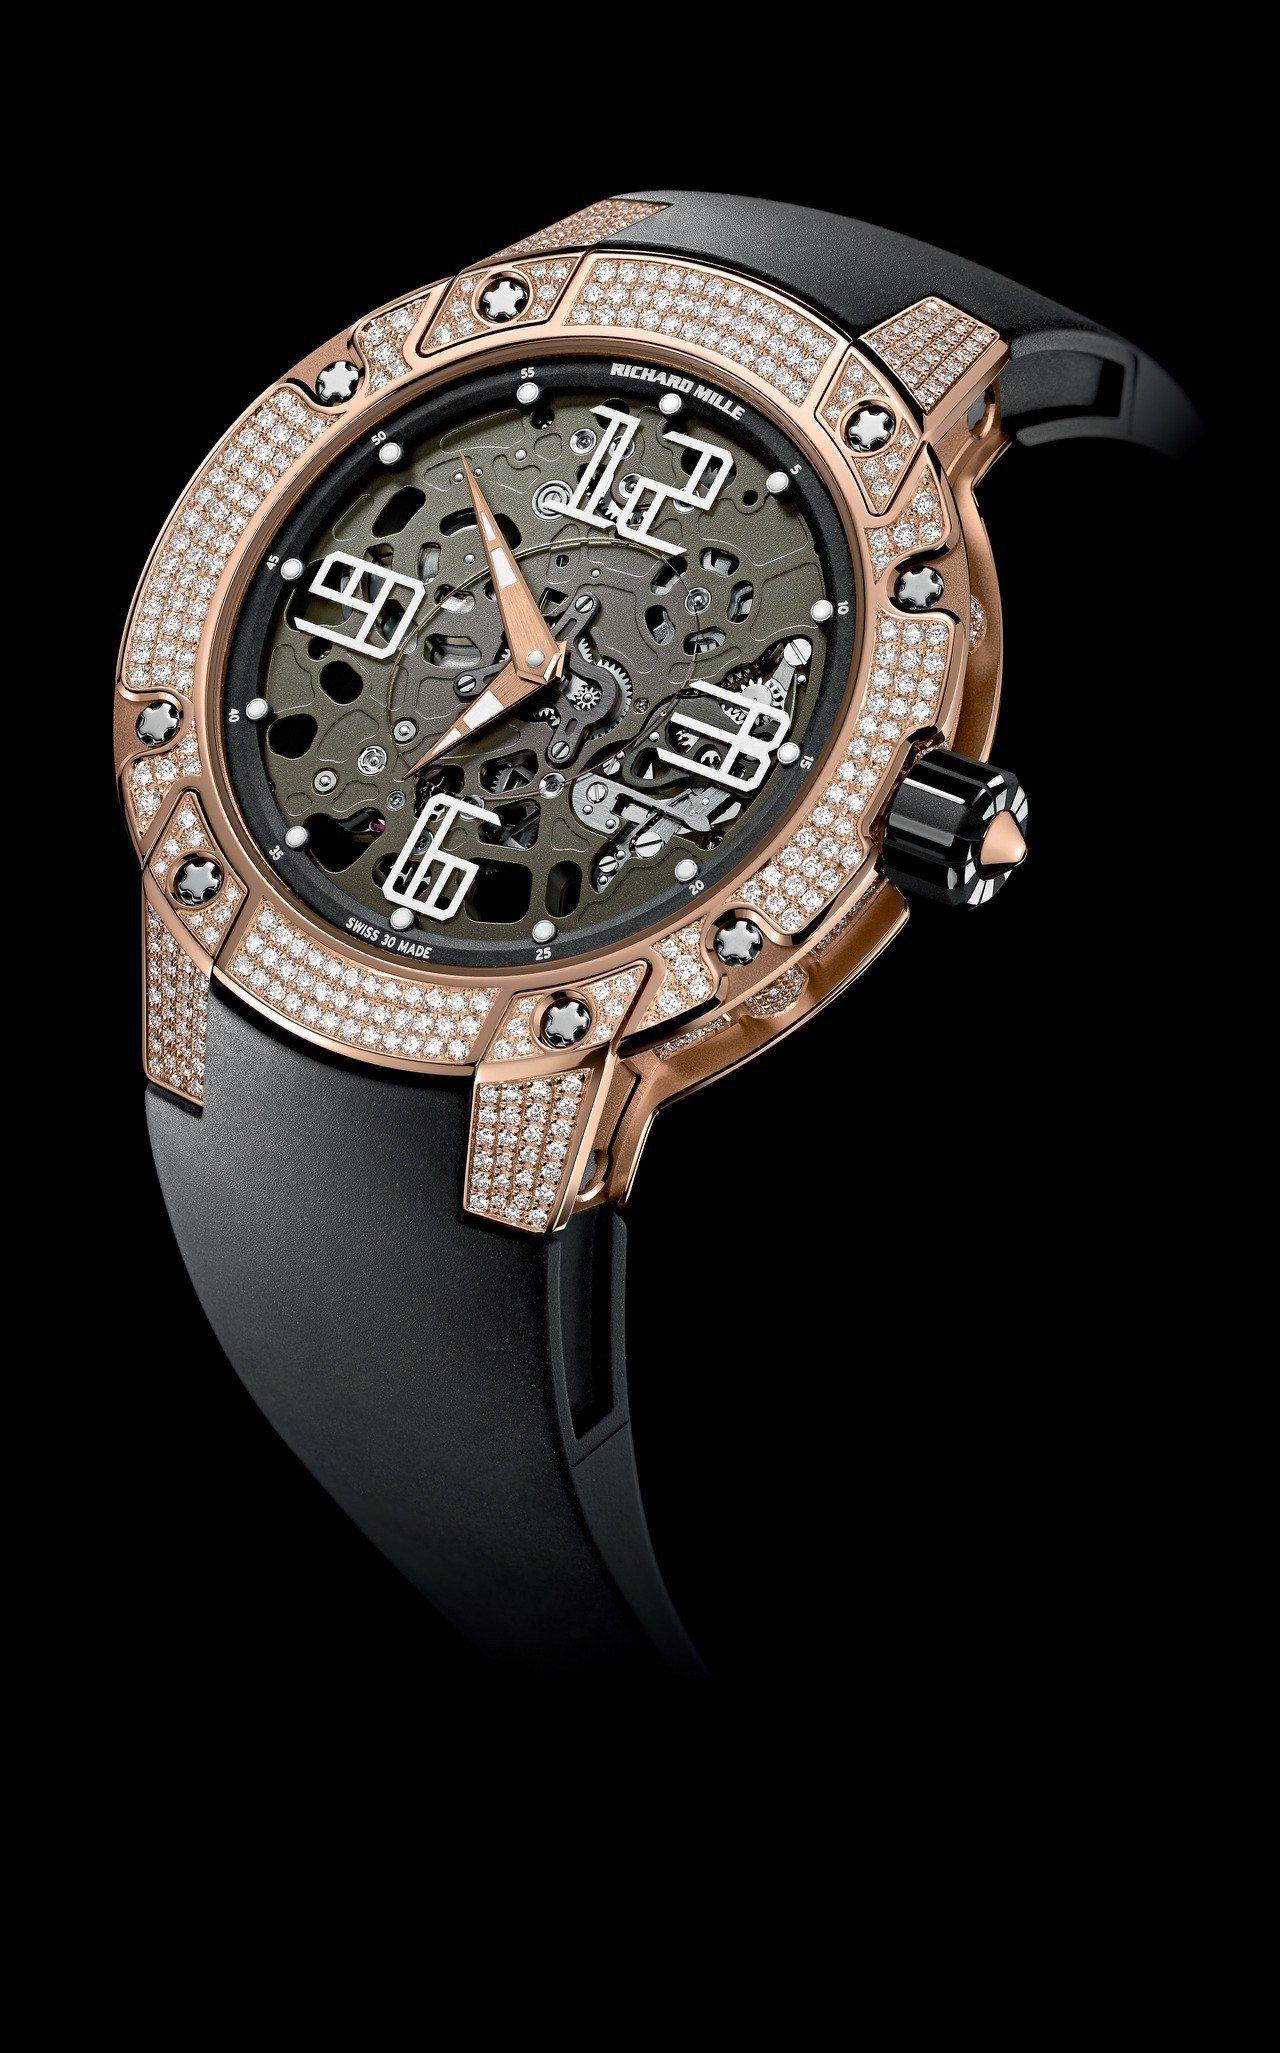 RICHARD MILLE RM033超薄鑲鑽腕表,18K玫瑰金表殼,搭載鏤空R...